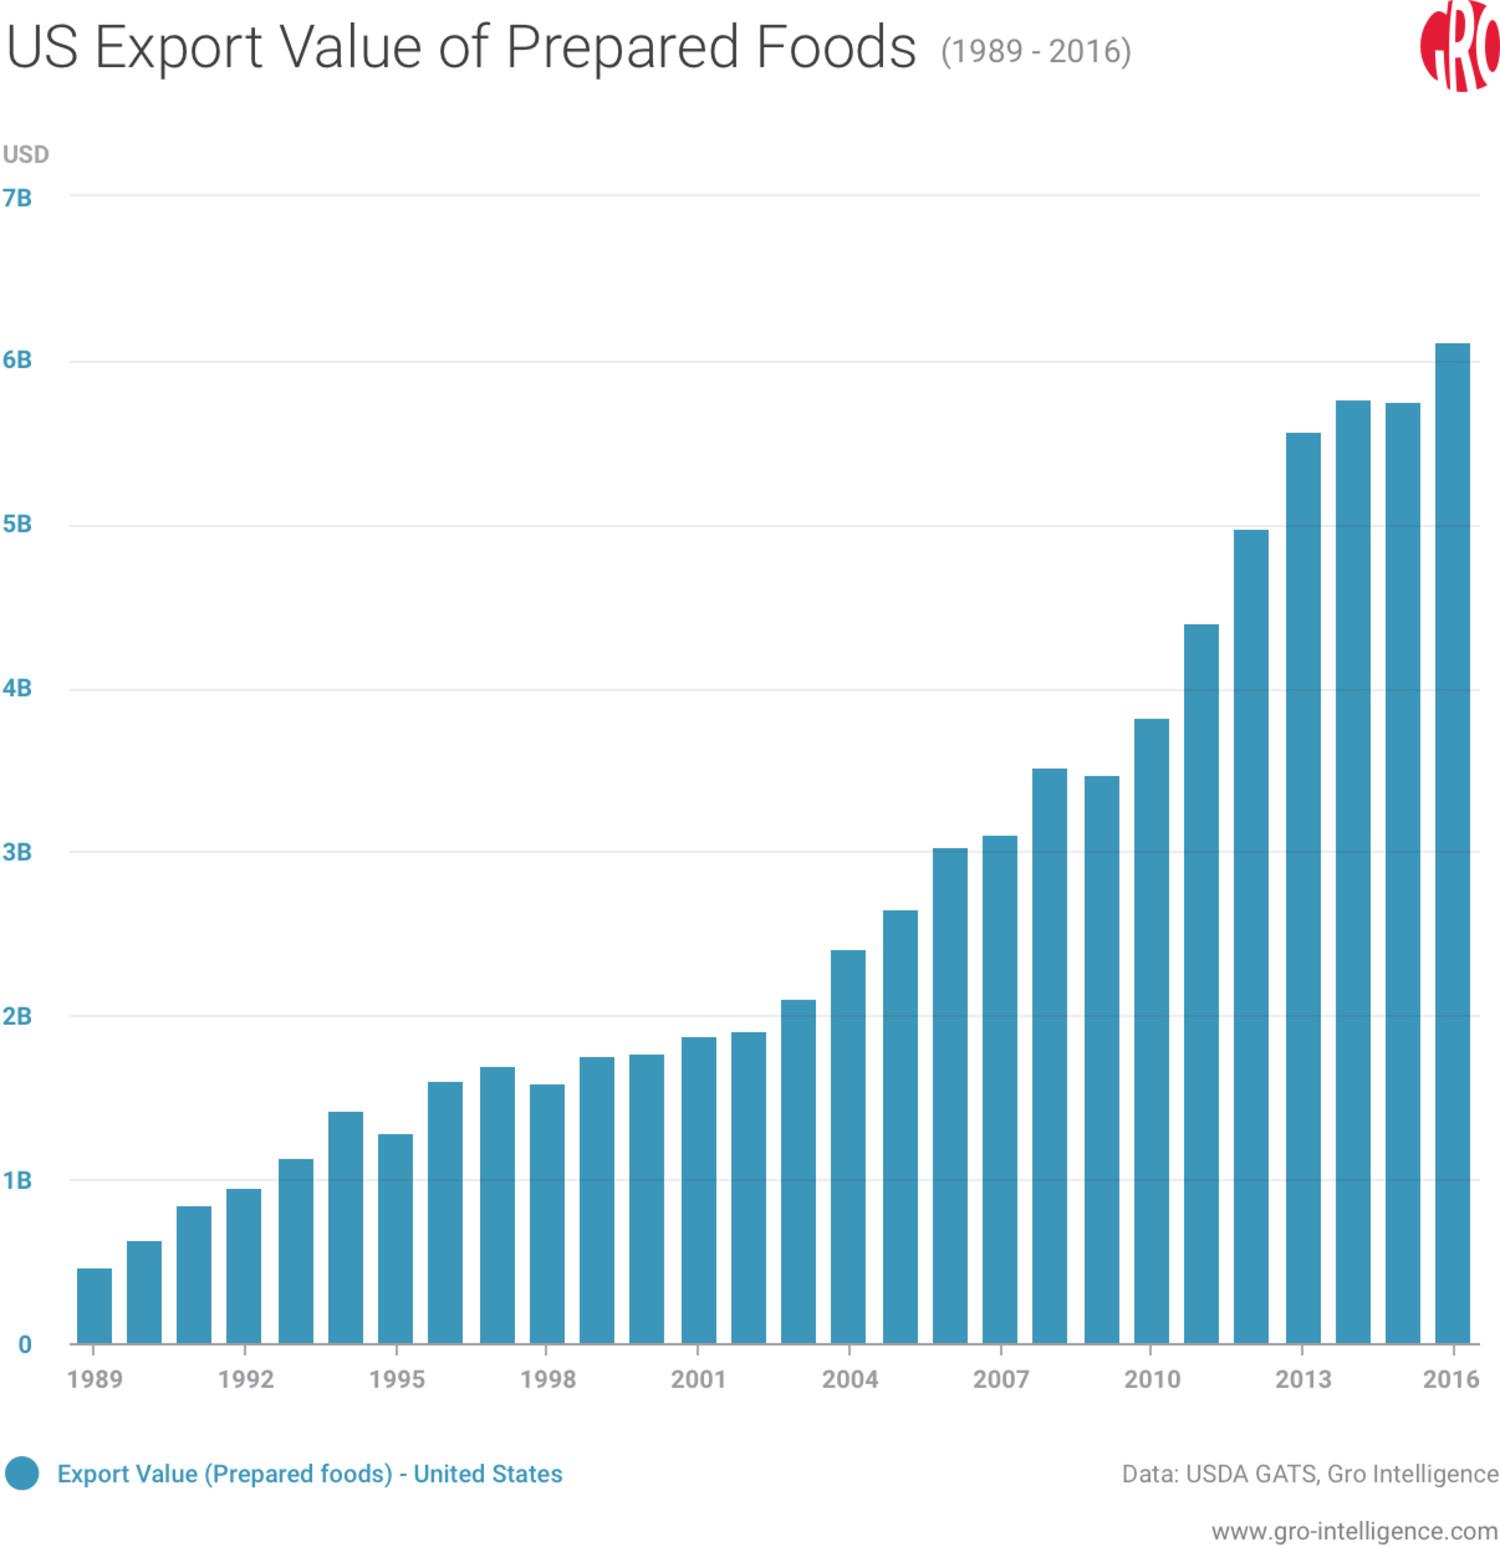 US Export Value of Prepared Foods